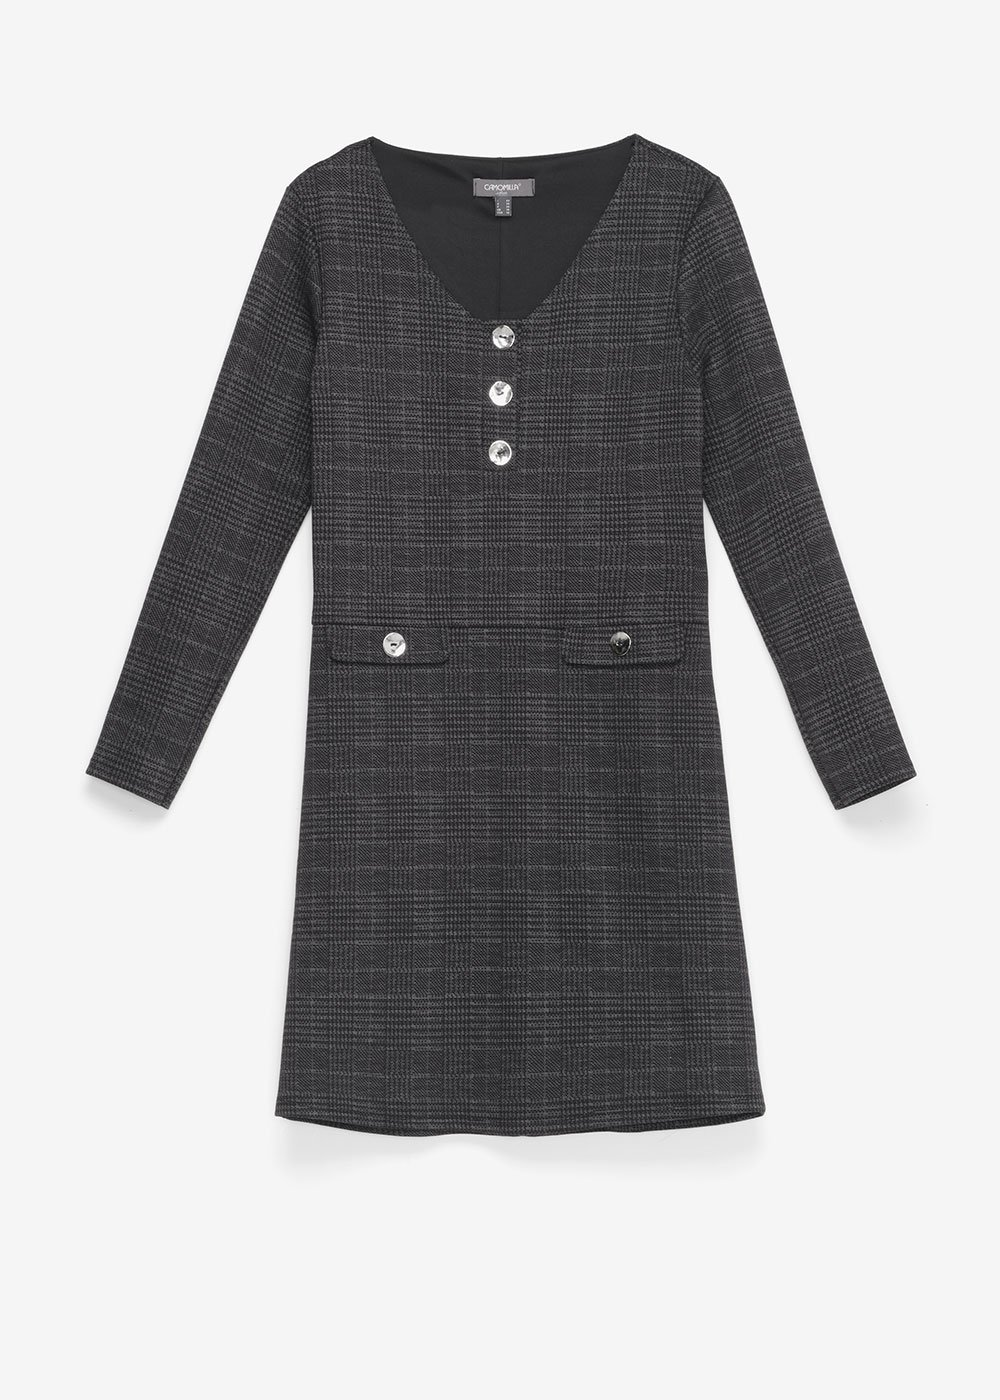 Astrid dress with check pattern - Black  / Grey Multi - Woman